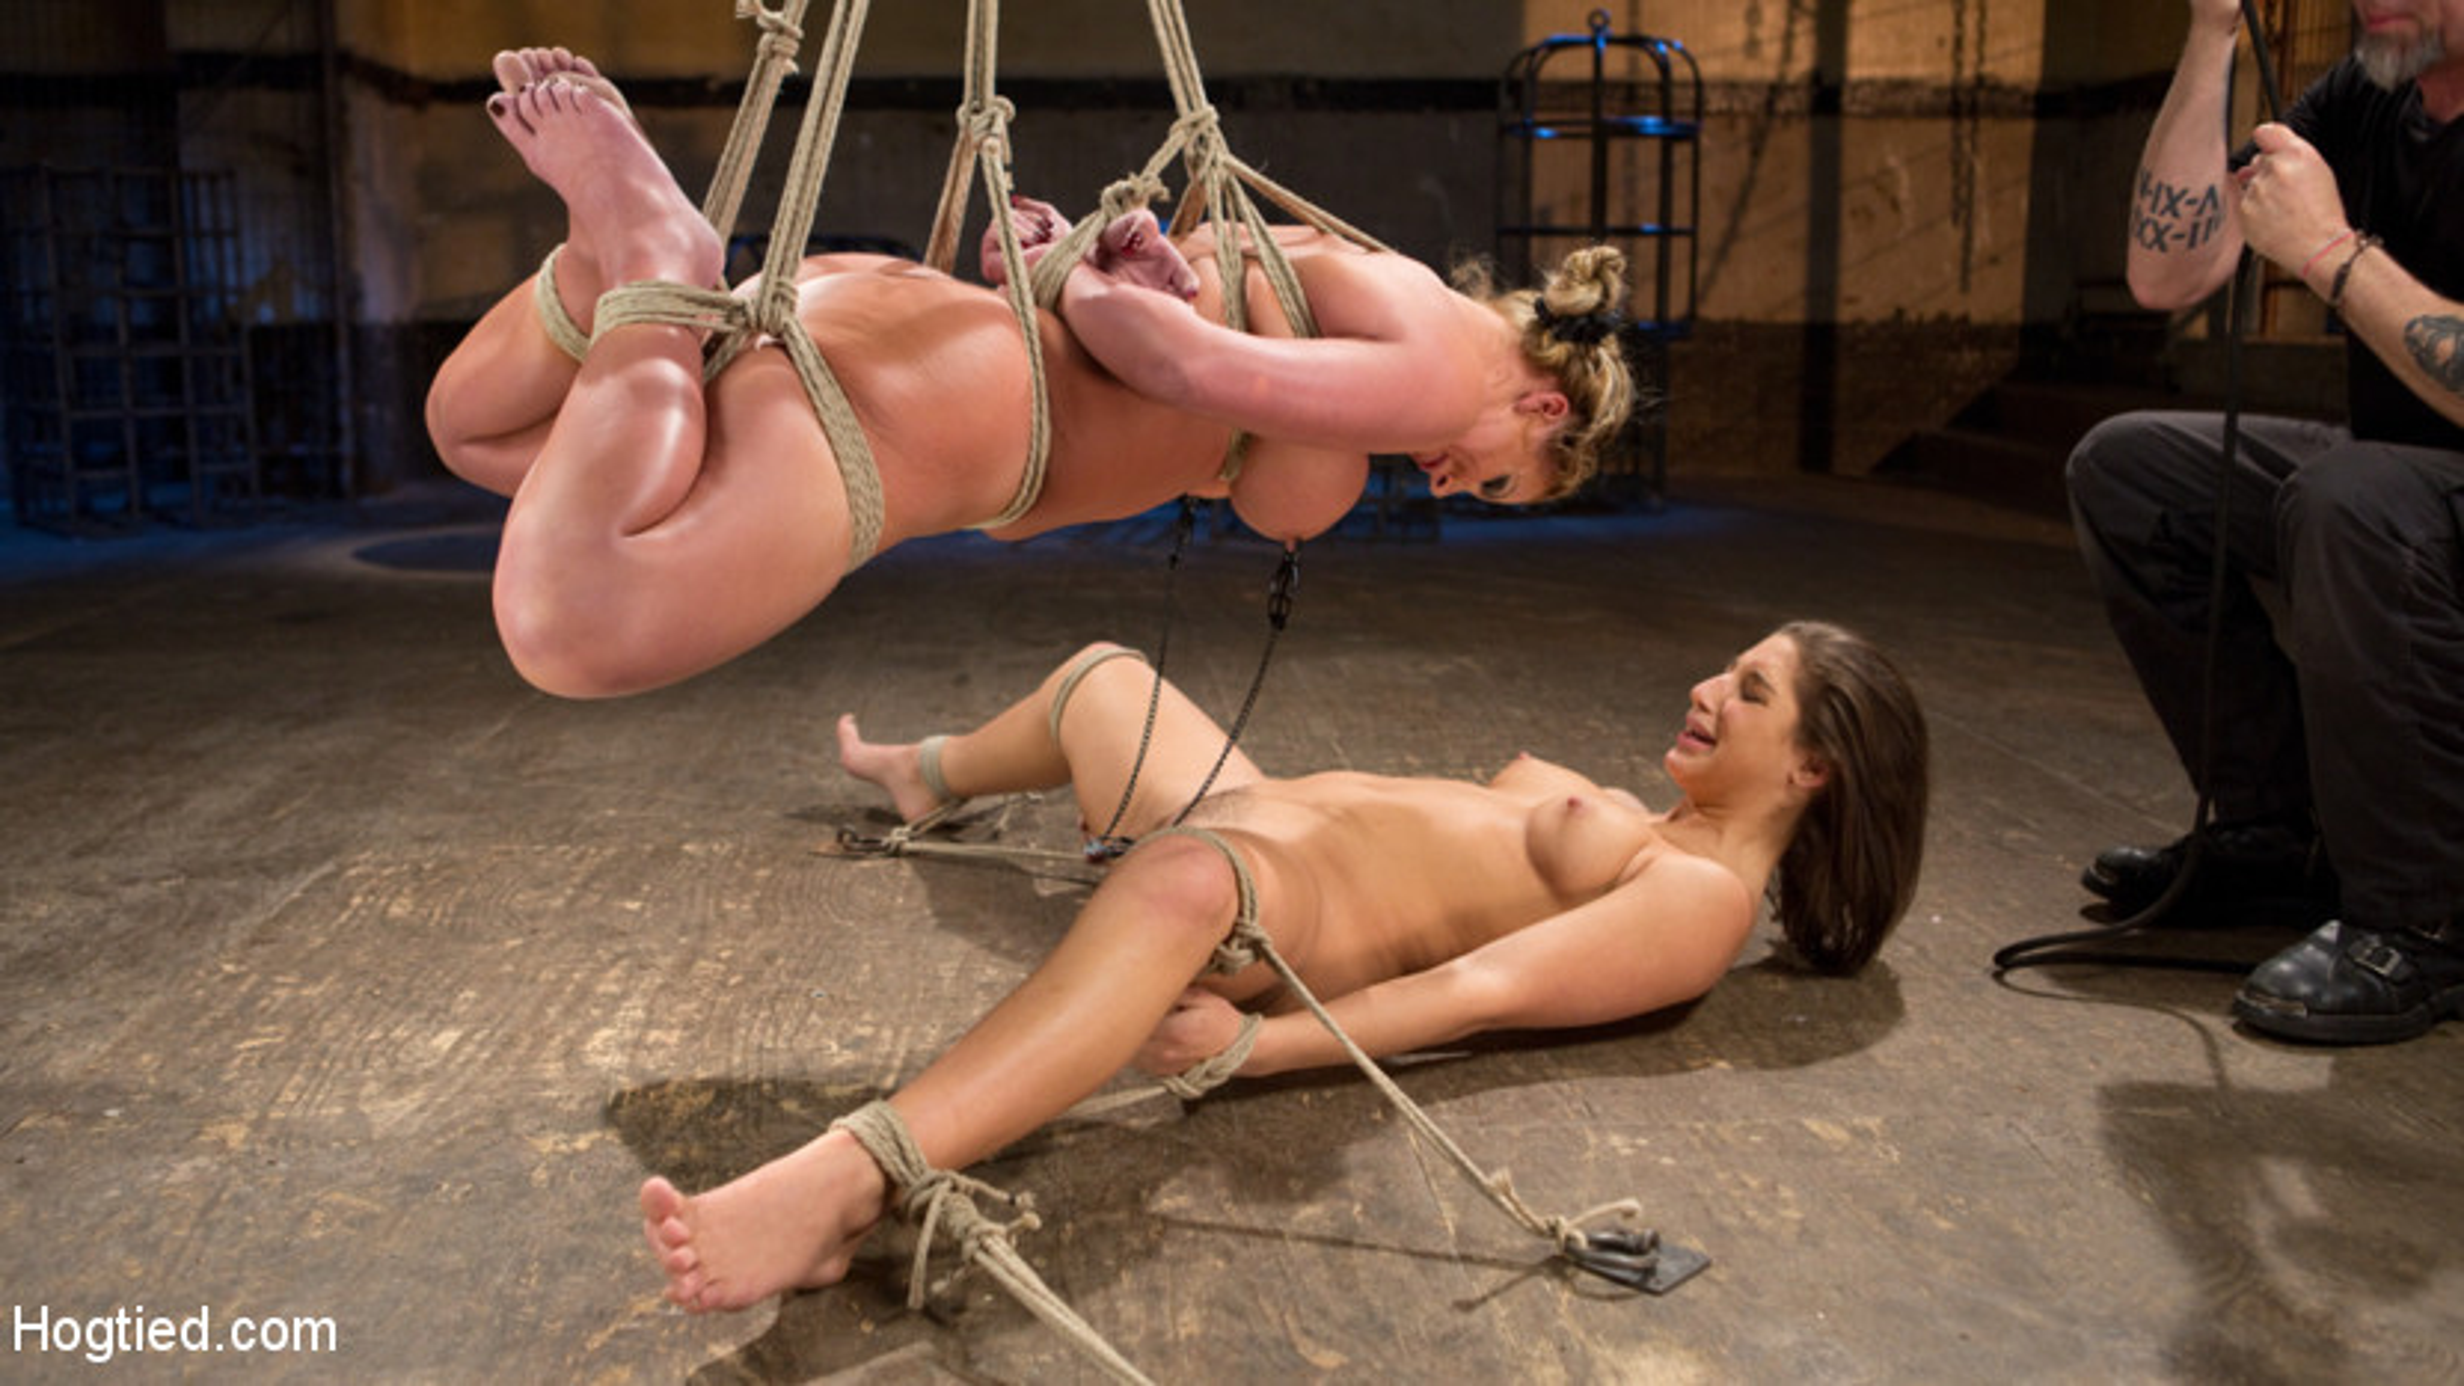 Phoenix Marie e Abella Pericolo Helpless in schiavitù, tormentato e Made to Cum !! (Kink)